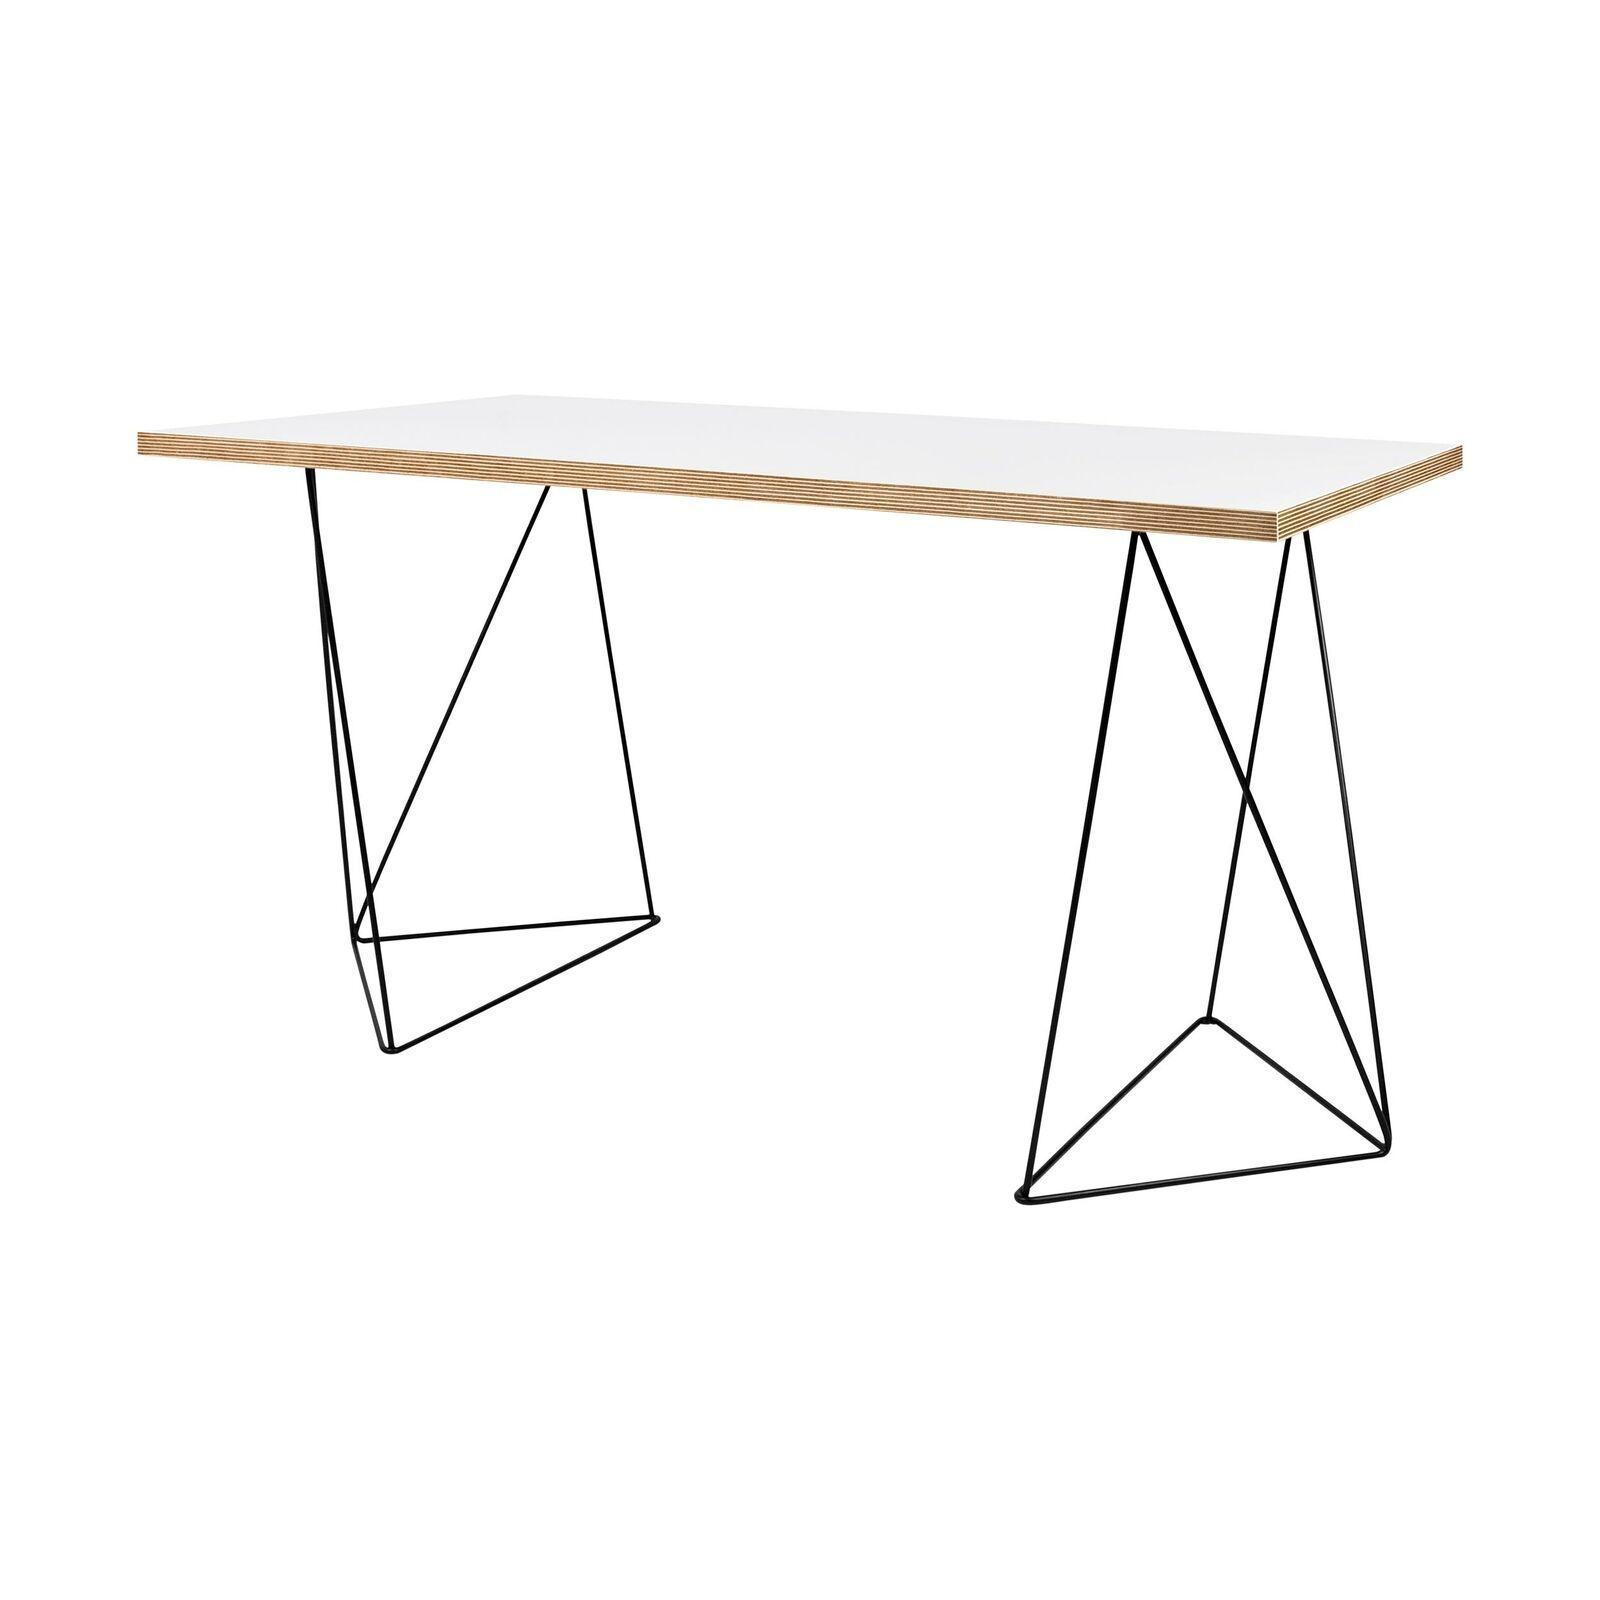 Wigan Schreibtisch Weiss Schwarz 140 X 75 Cm H 75 Cm Buromobel Ideen Von Buromobel Buromobel In 2020 Ikea Office Furniture Ikea Office Office Furniture Design